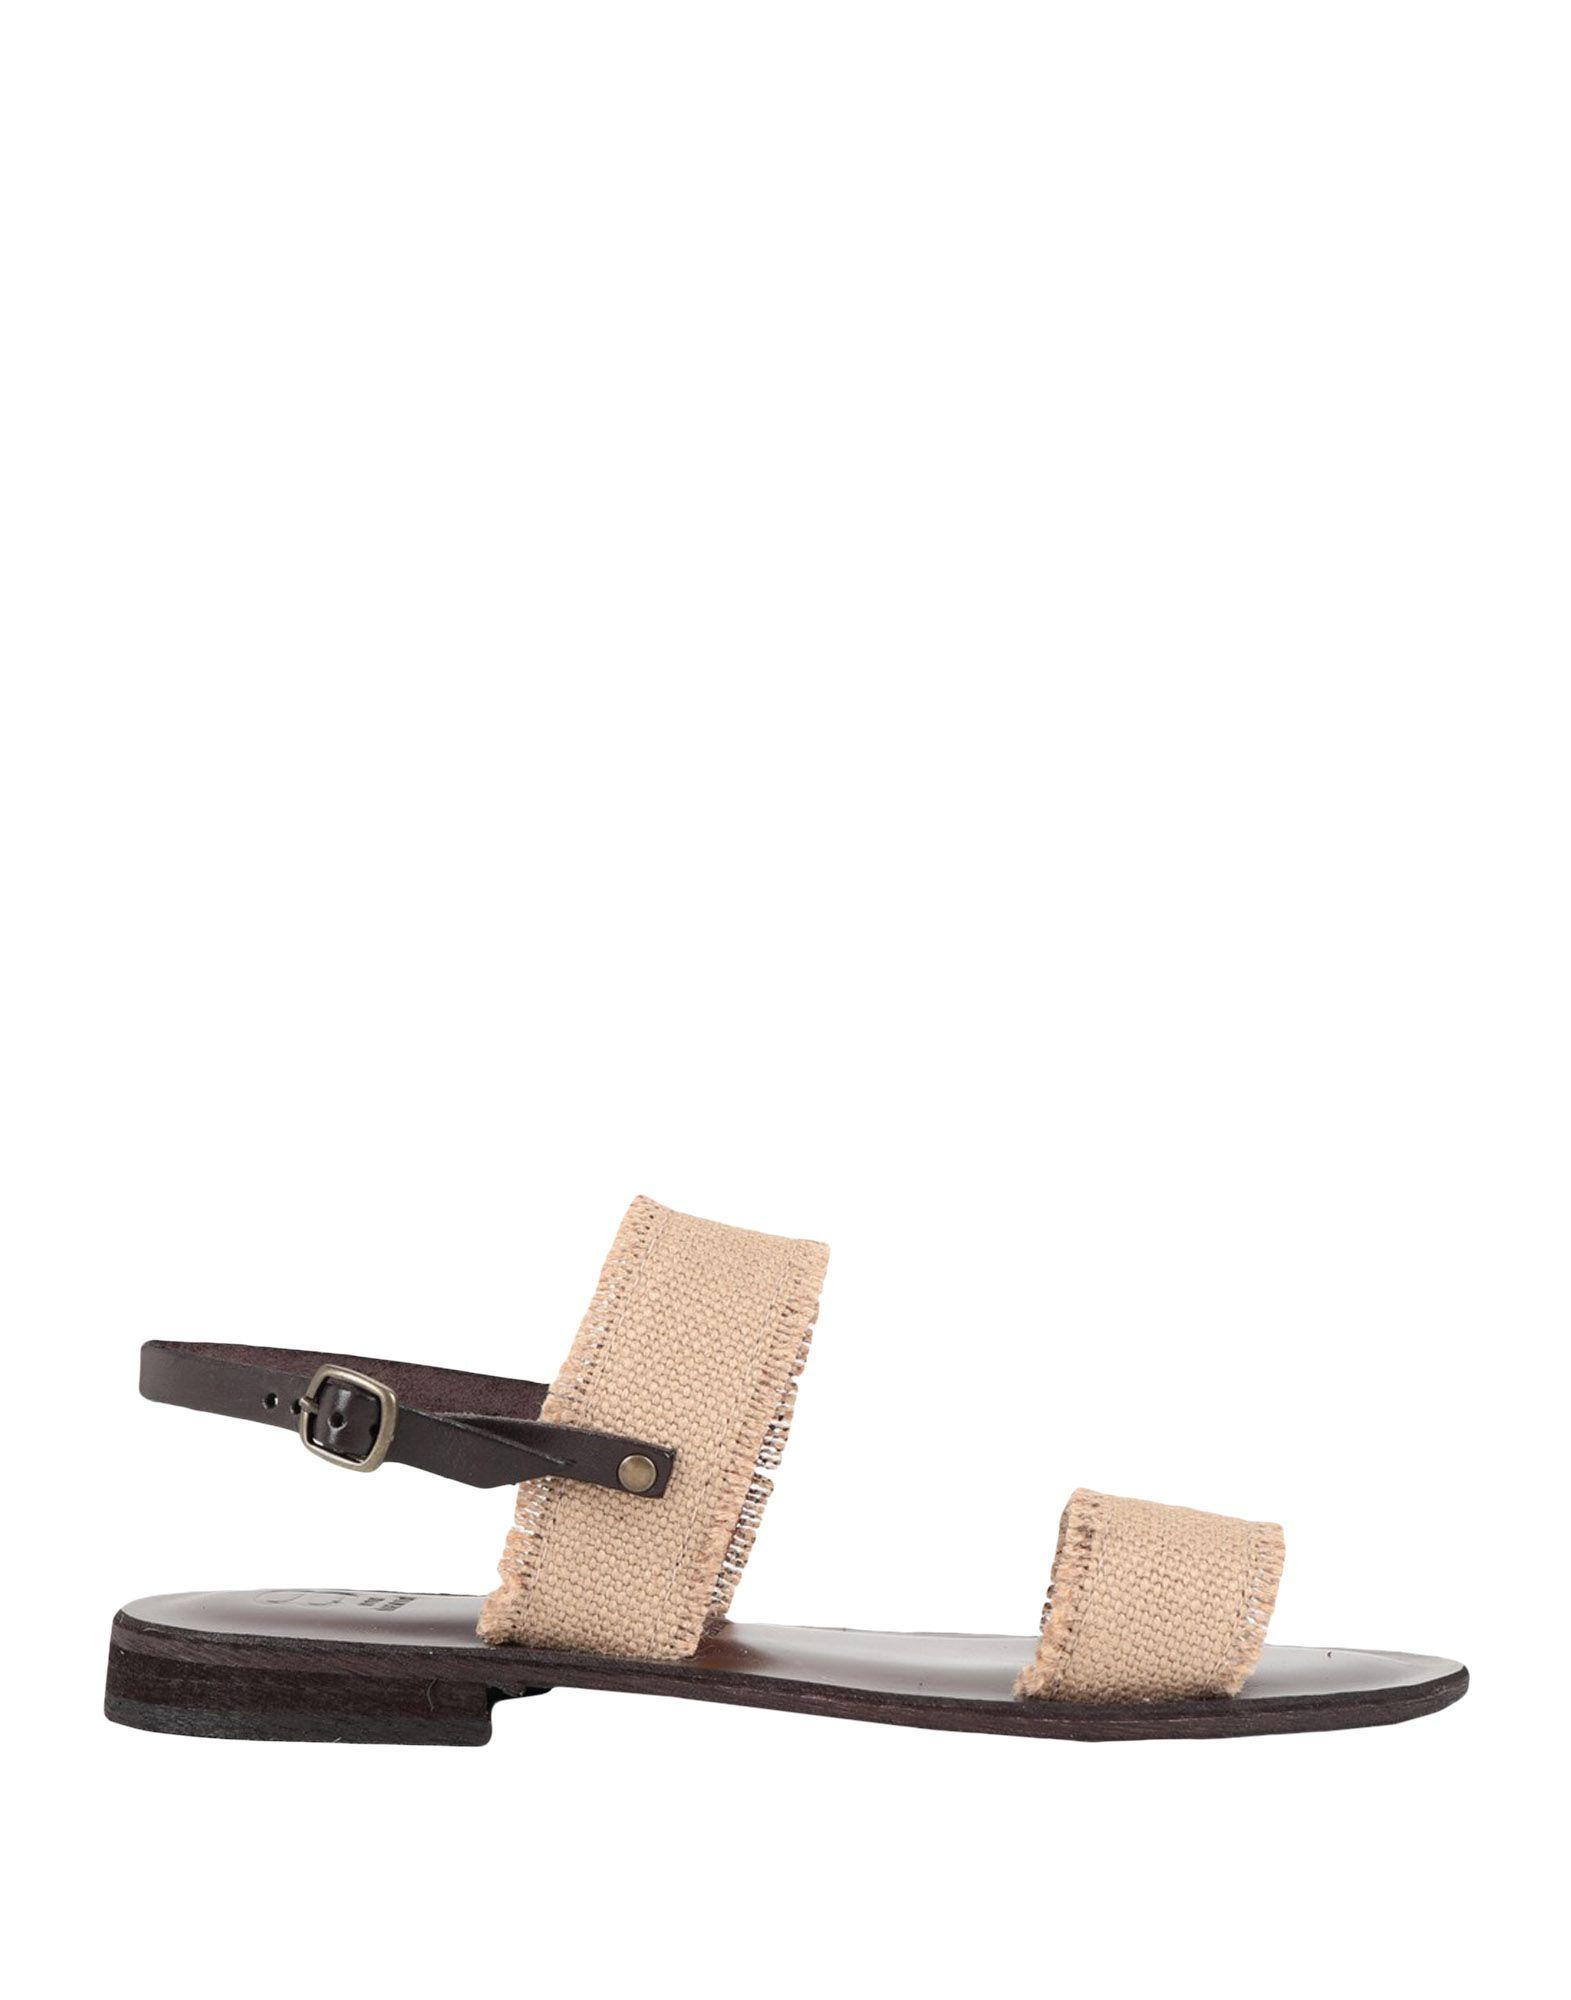 8 by YOOX Сандалии сандалии из разноцветной кожи dixmille